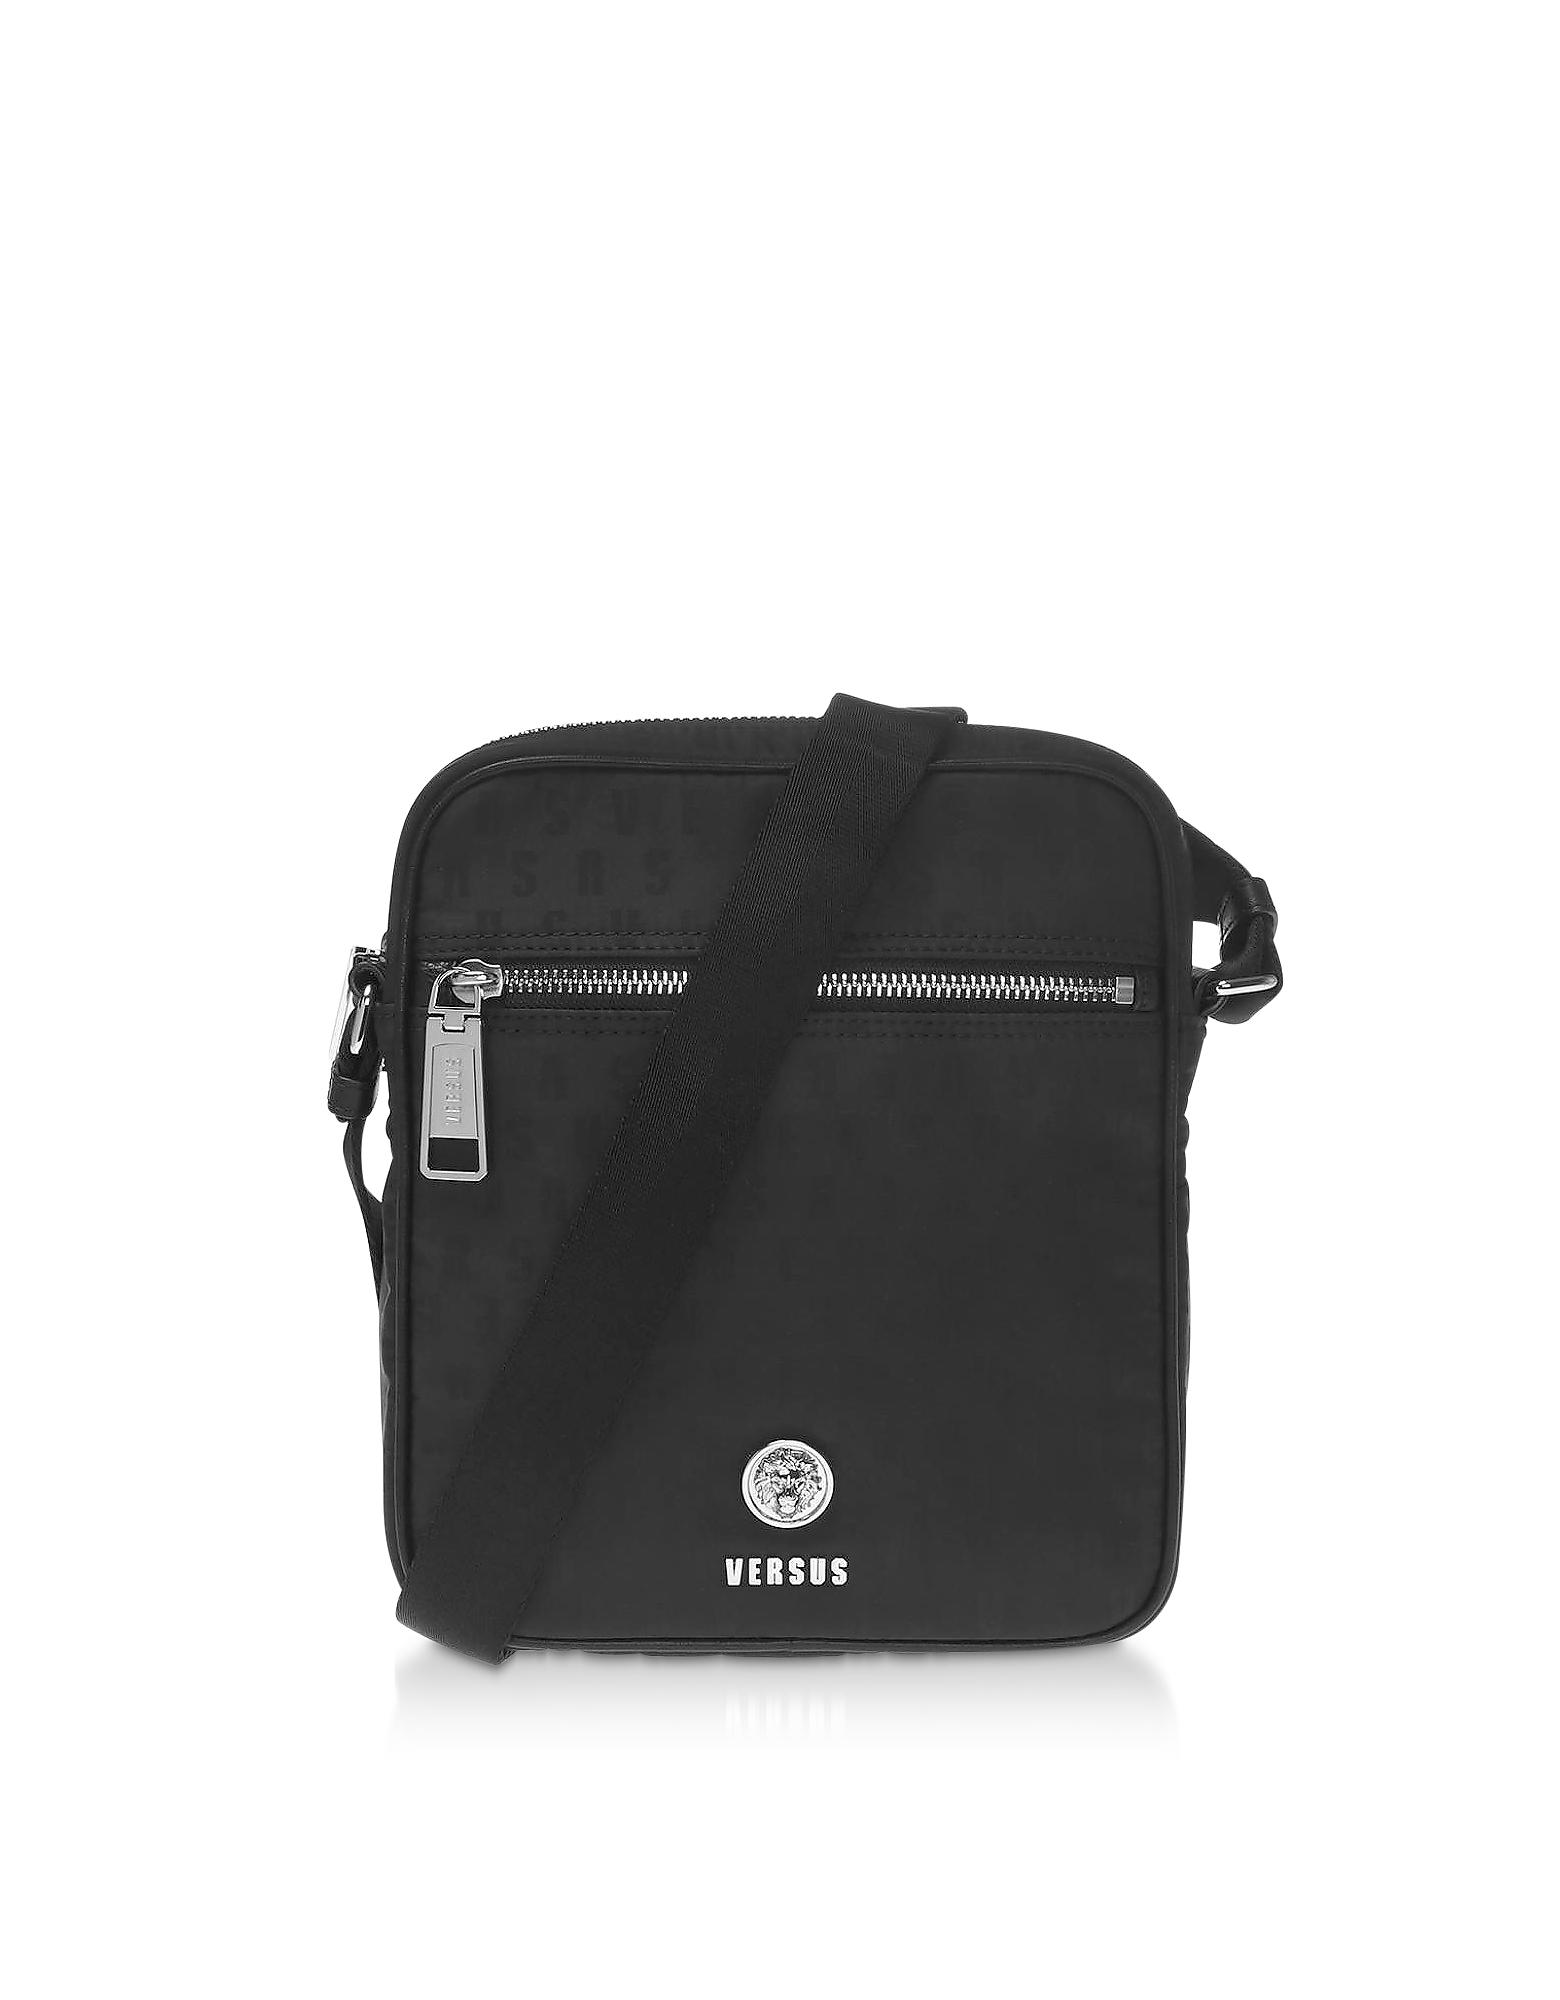 Black Signature Nylon Crossbody Bag